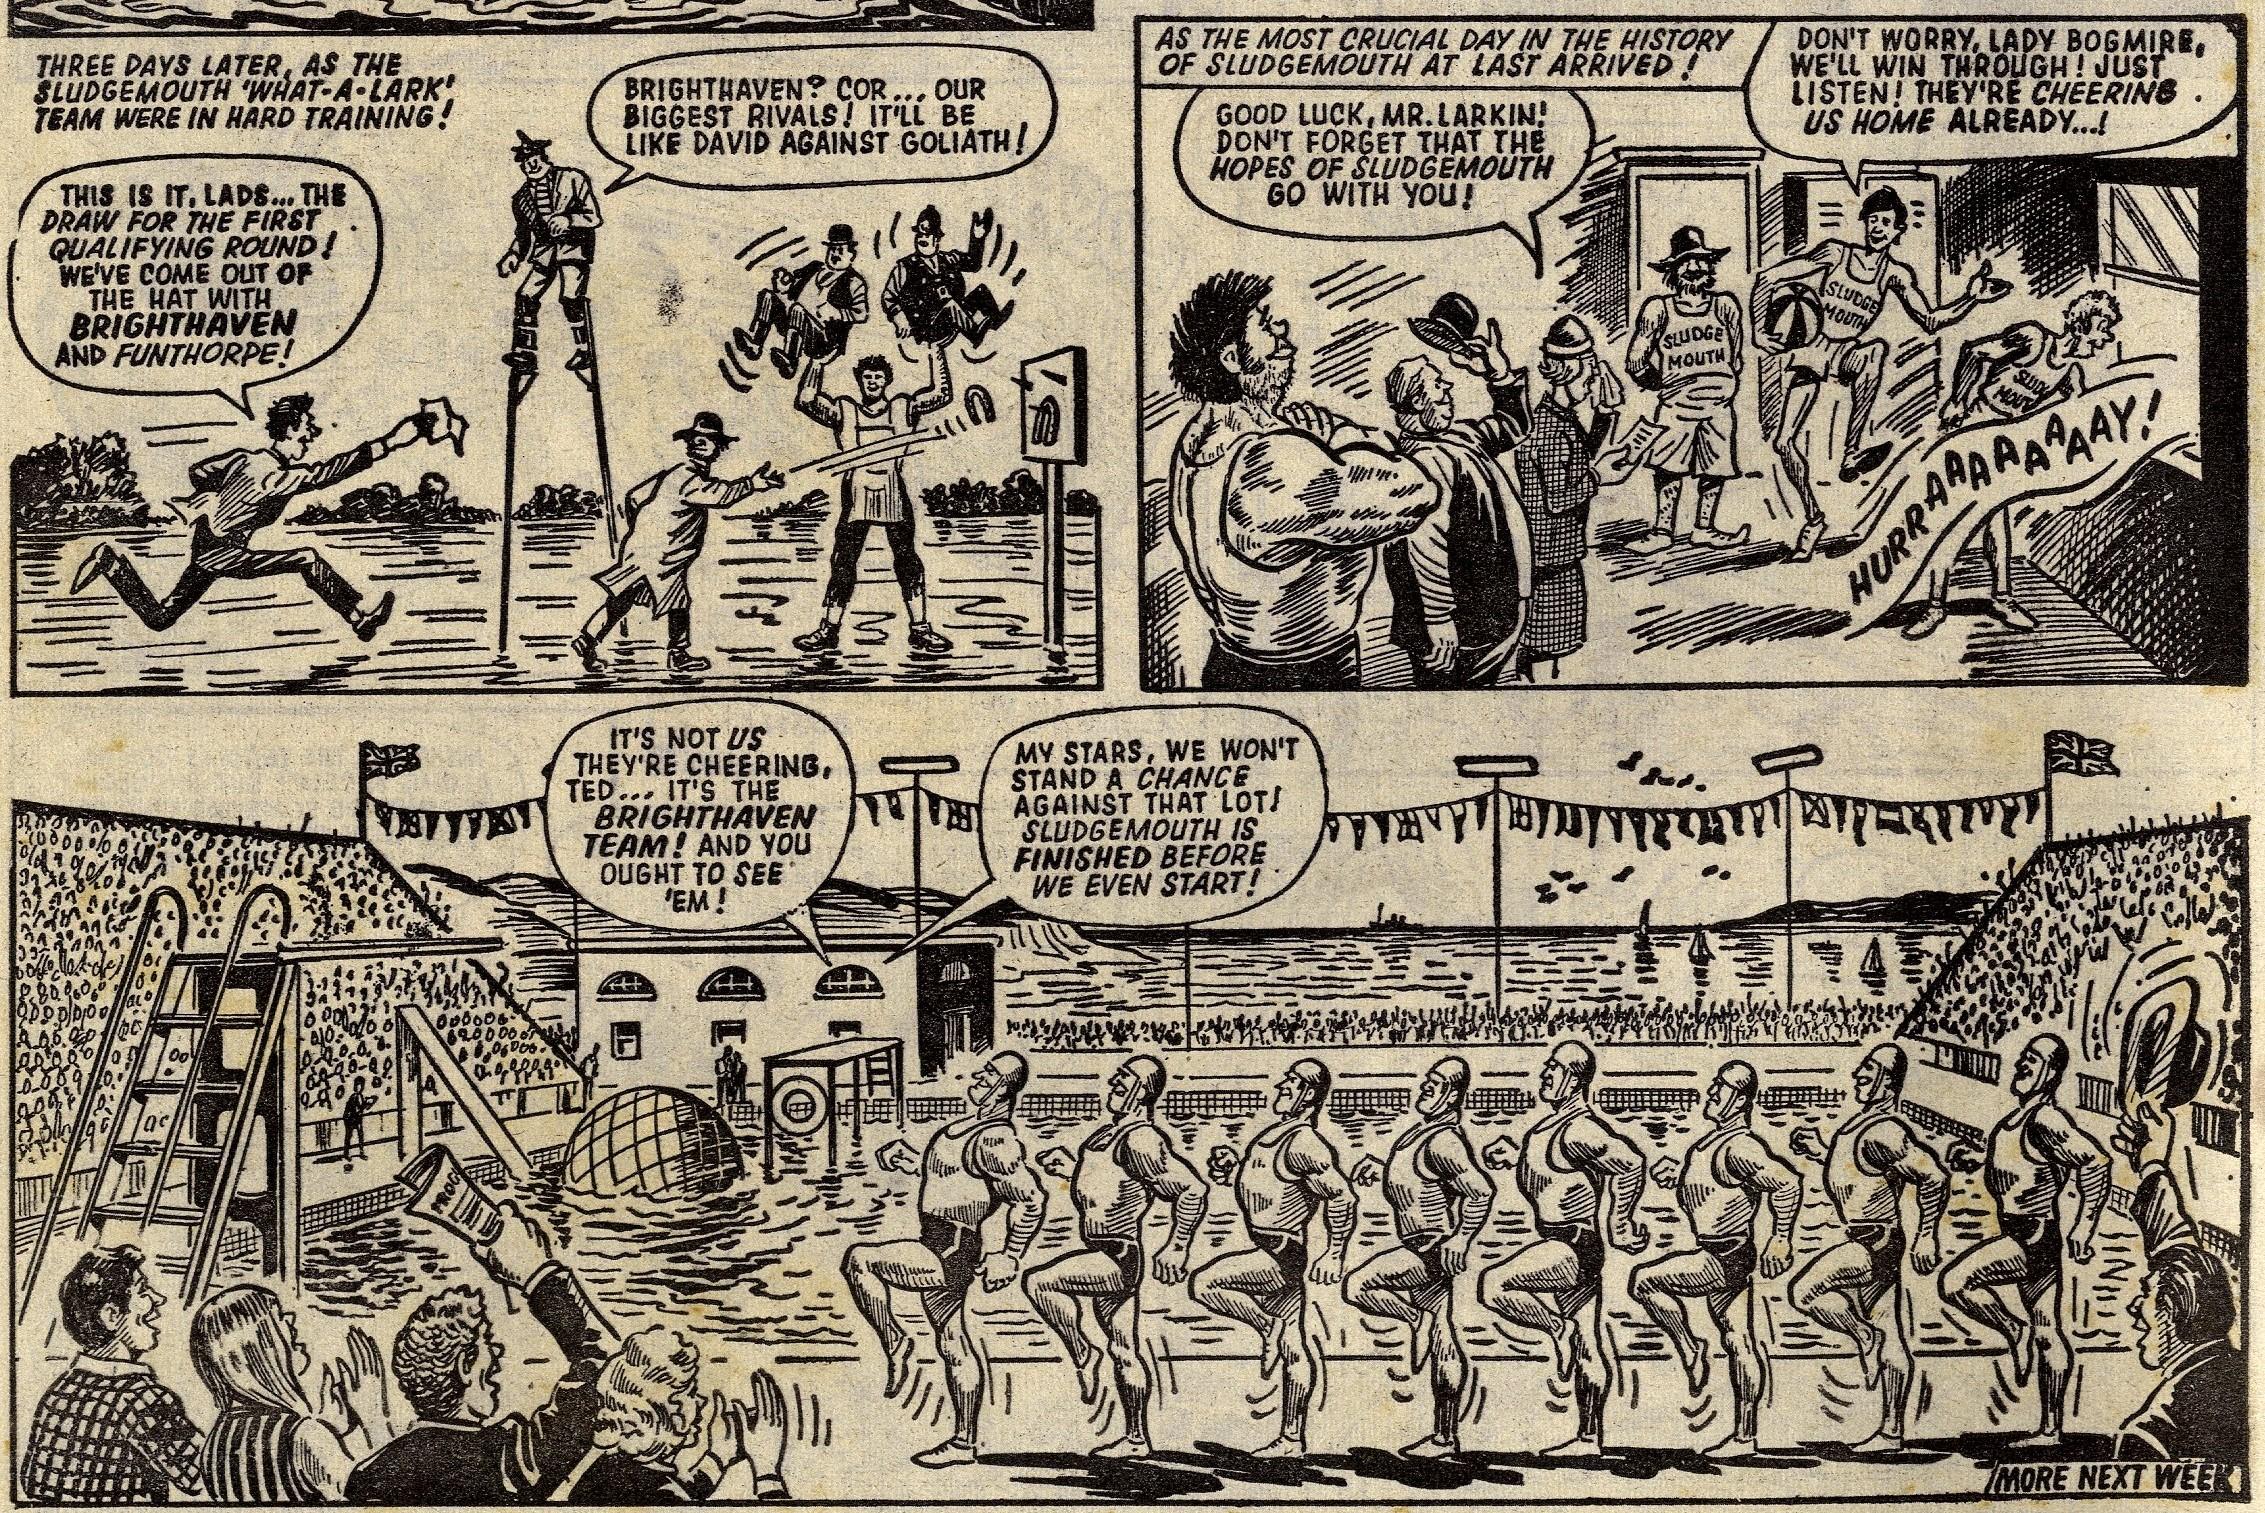 The Sludgemouth Sloggers: Doug Maxted (artist)